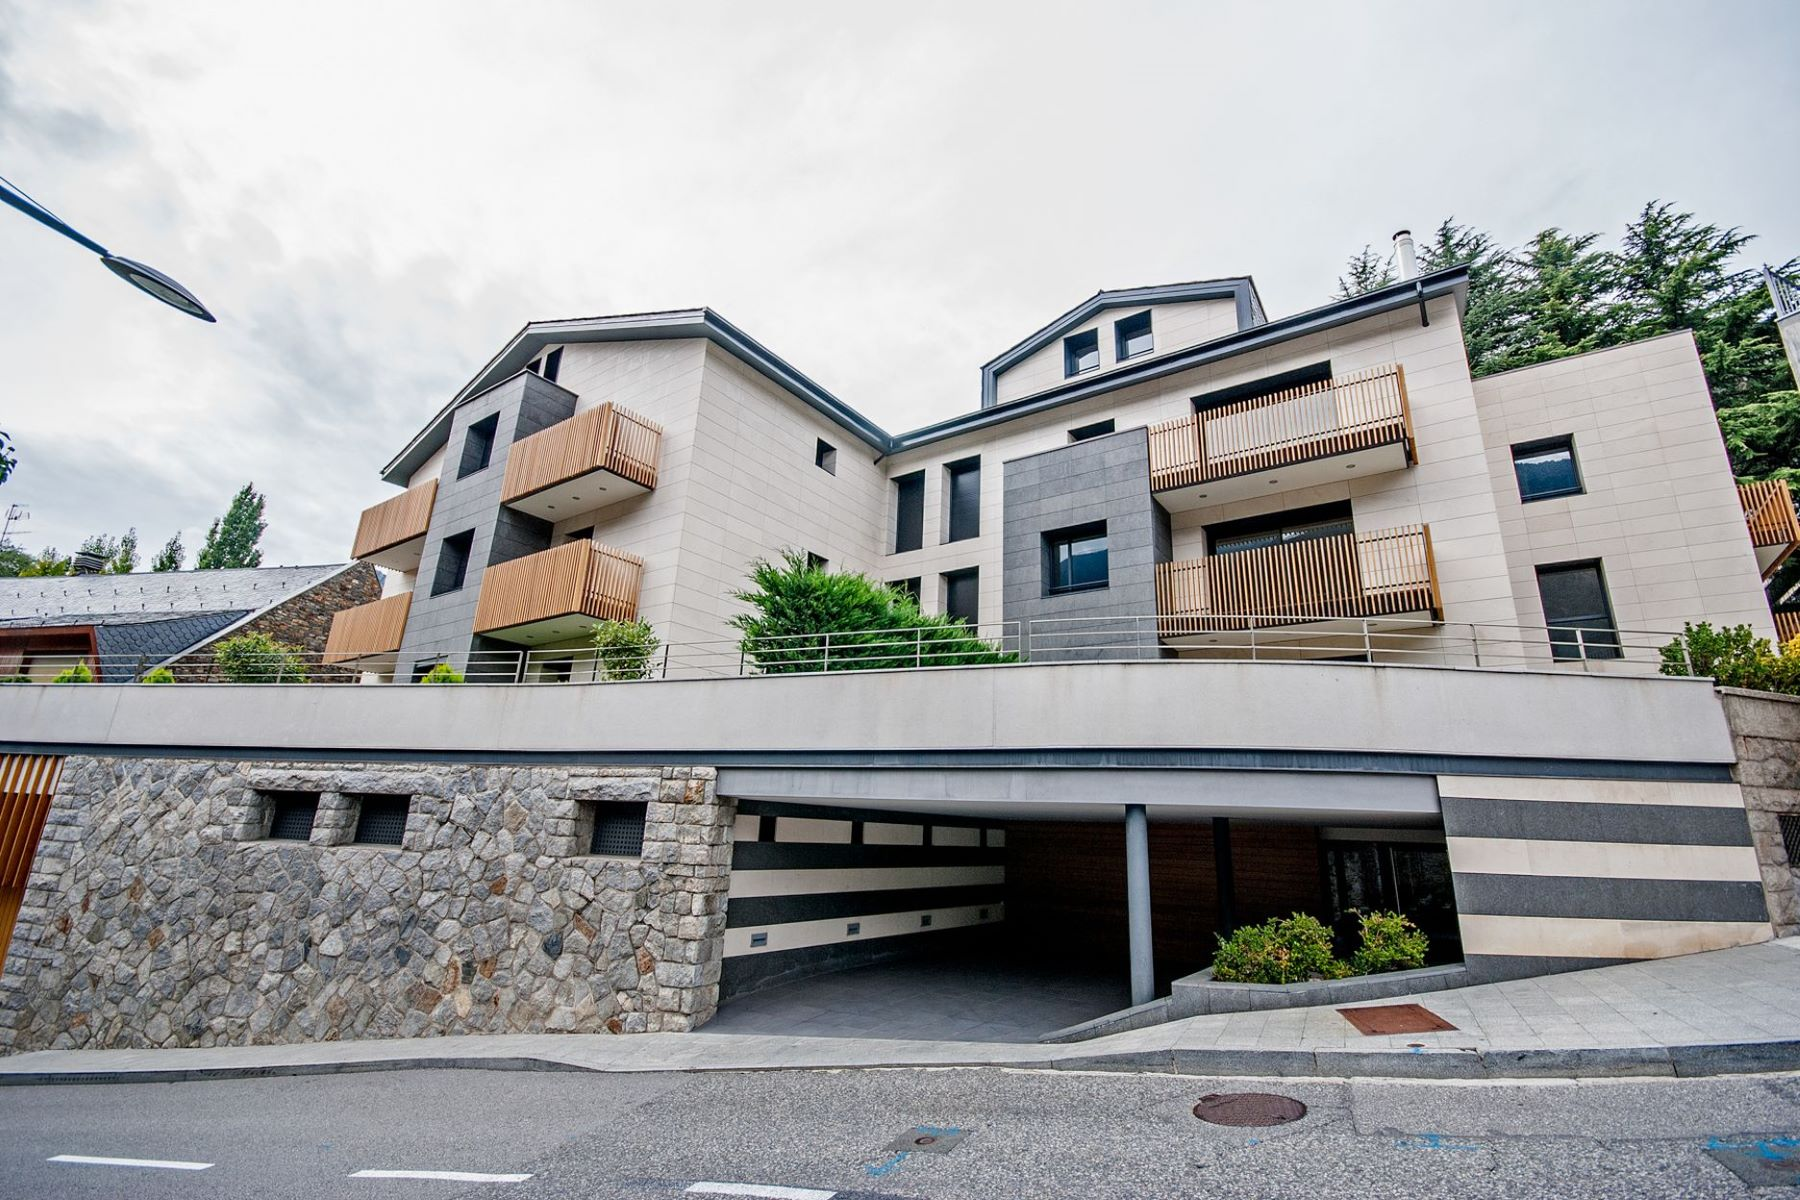 Appartement pour l Vente à Ground floor for sale in Andorra la Vella Andorra La Vella, Andorra La Vella, AD500 Andorra